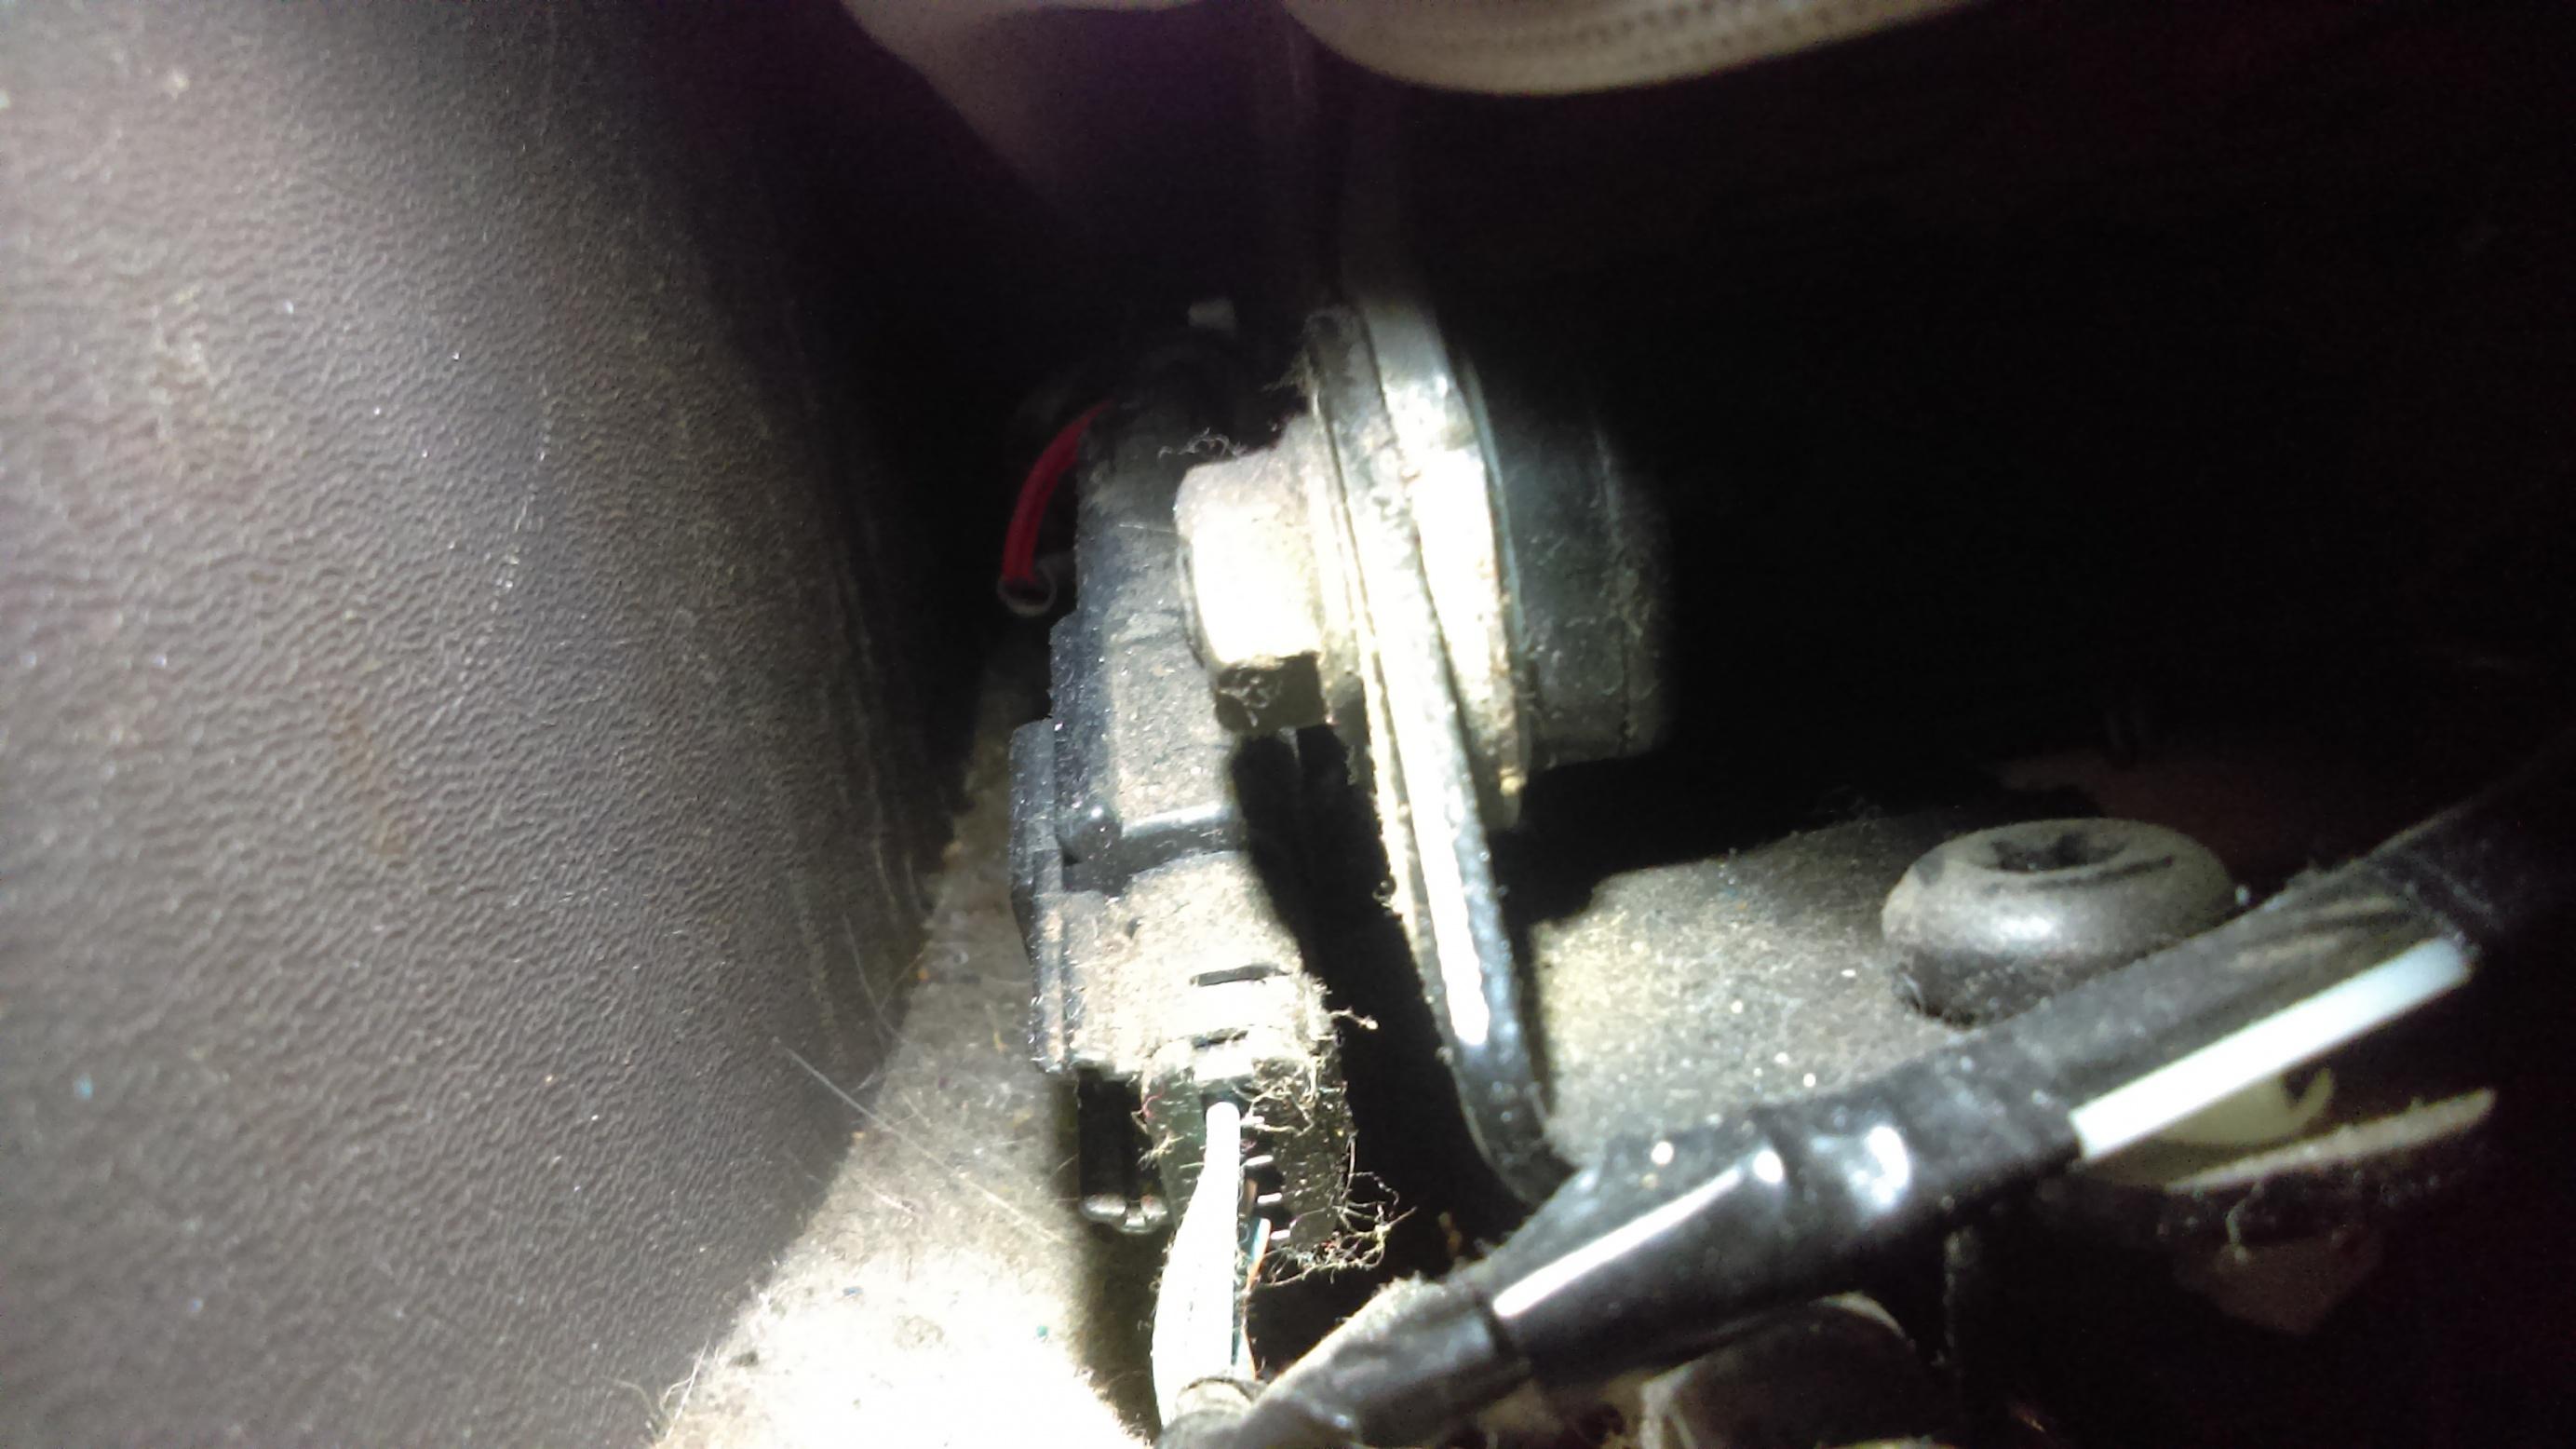 08-11 Rocking driver seat cheap fix-imag0955.jpg